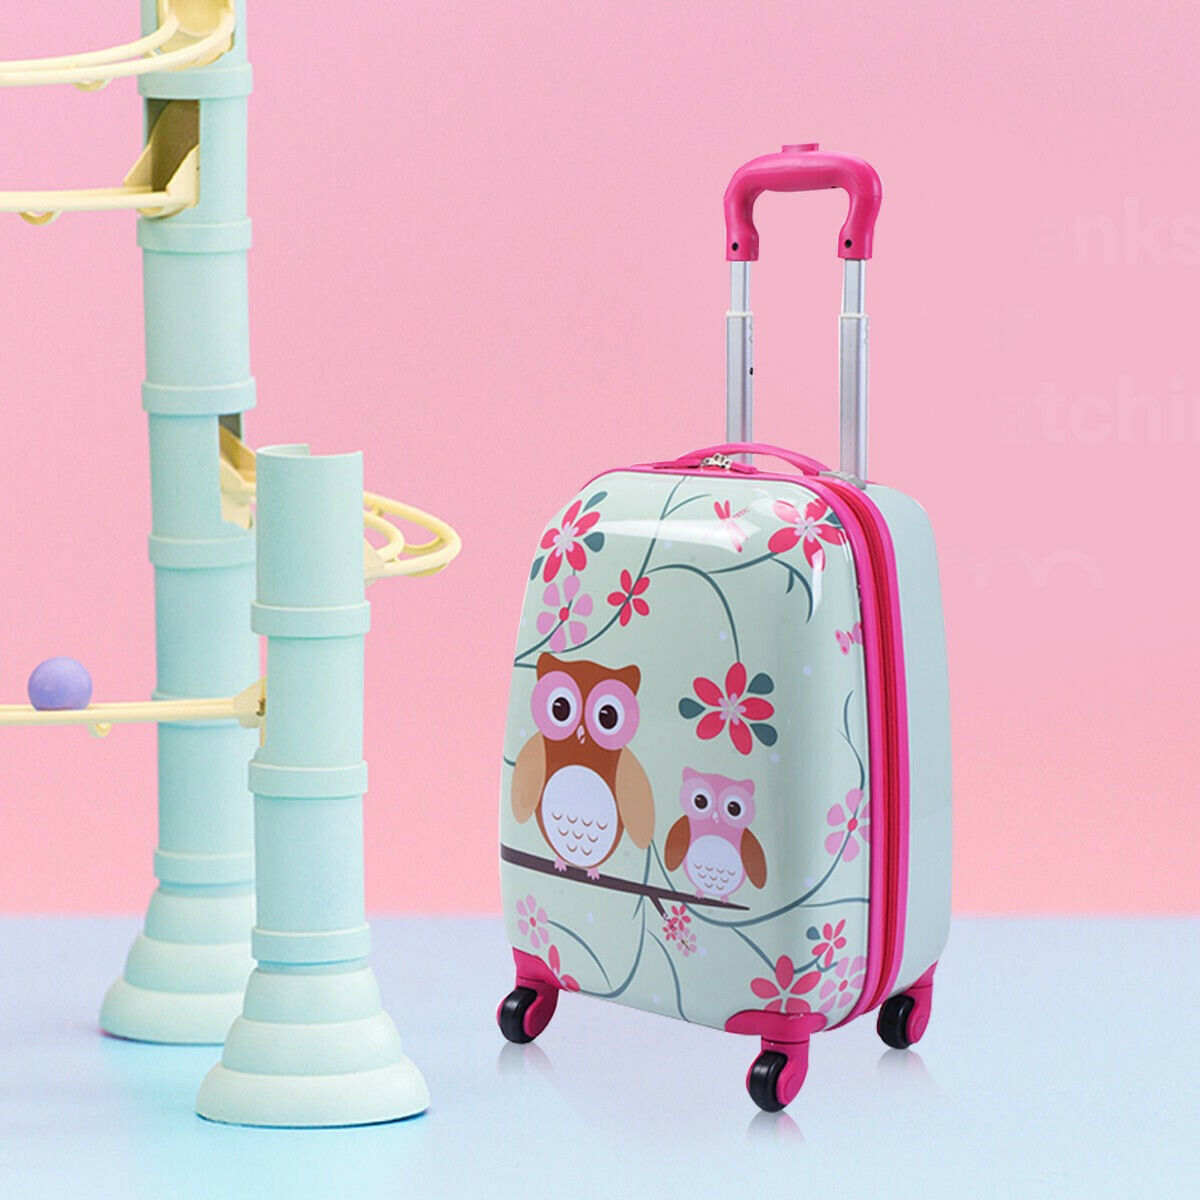 Enfants Hibou Sac à Dos Bagages Valise Trolley Set enfants Travel Case Fun Sac